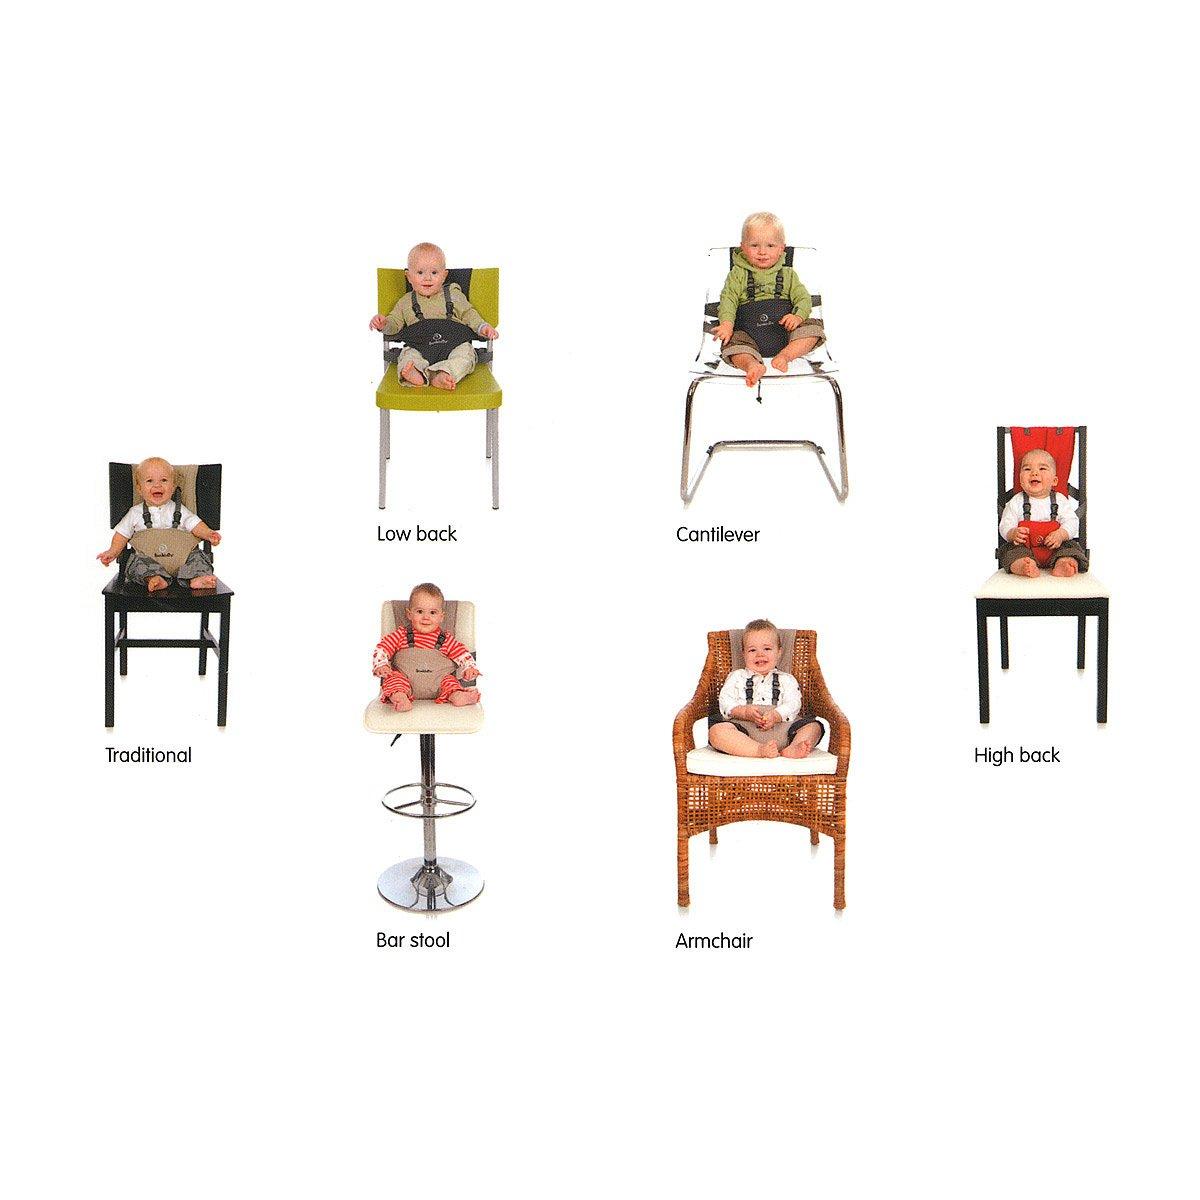 Portachair Harness 3 thumbnail  sc 1 st  UncommonGoods & Portachair Harness   Portable Baby Chair Bambinoz   UncommonGoods